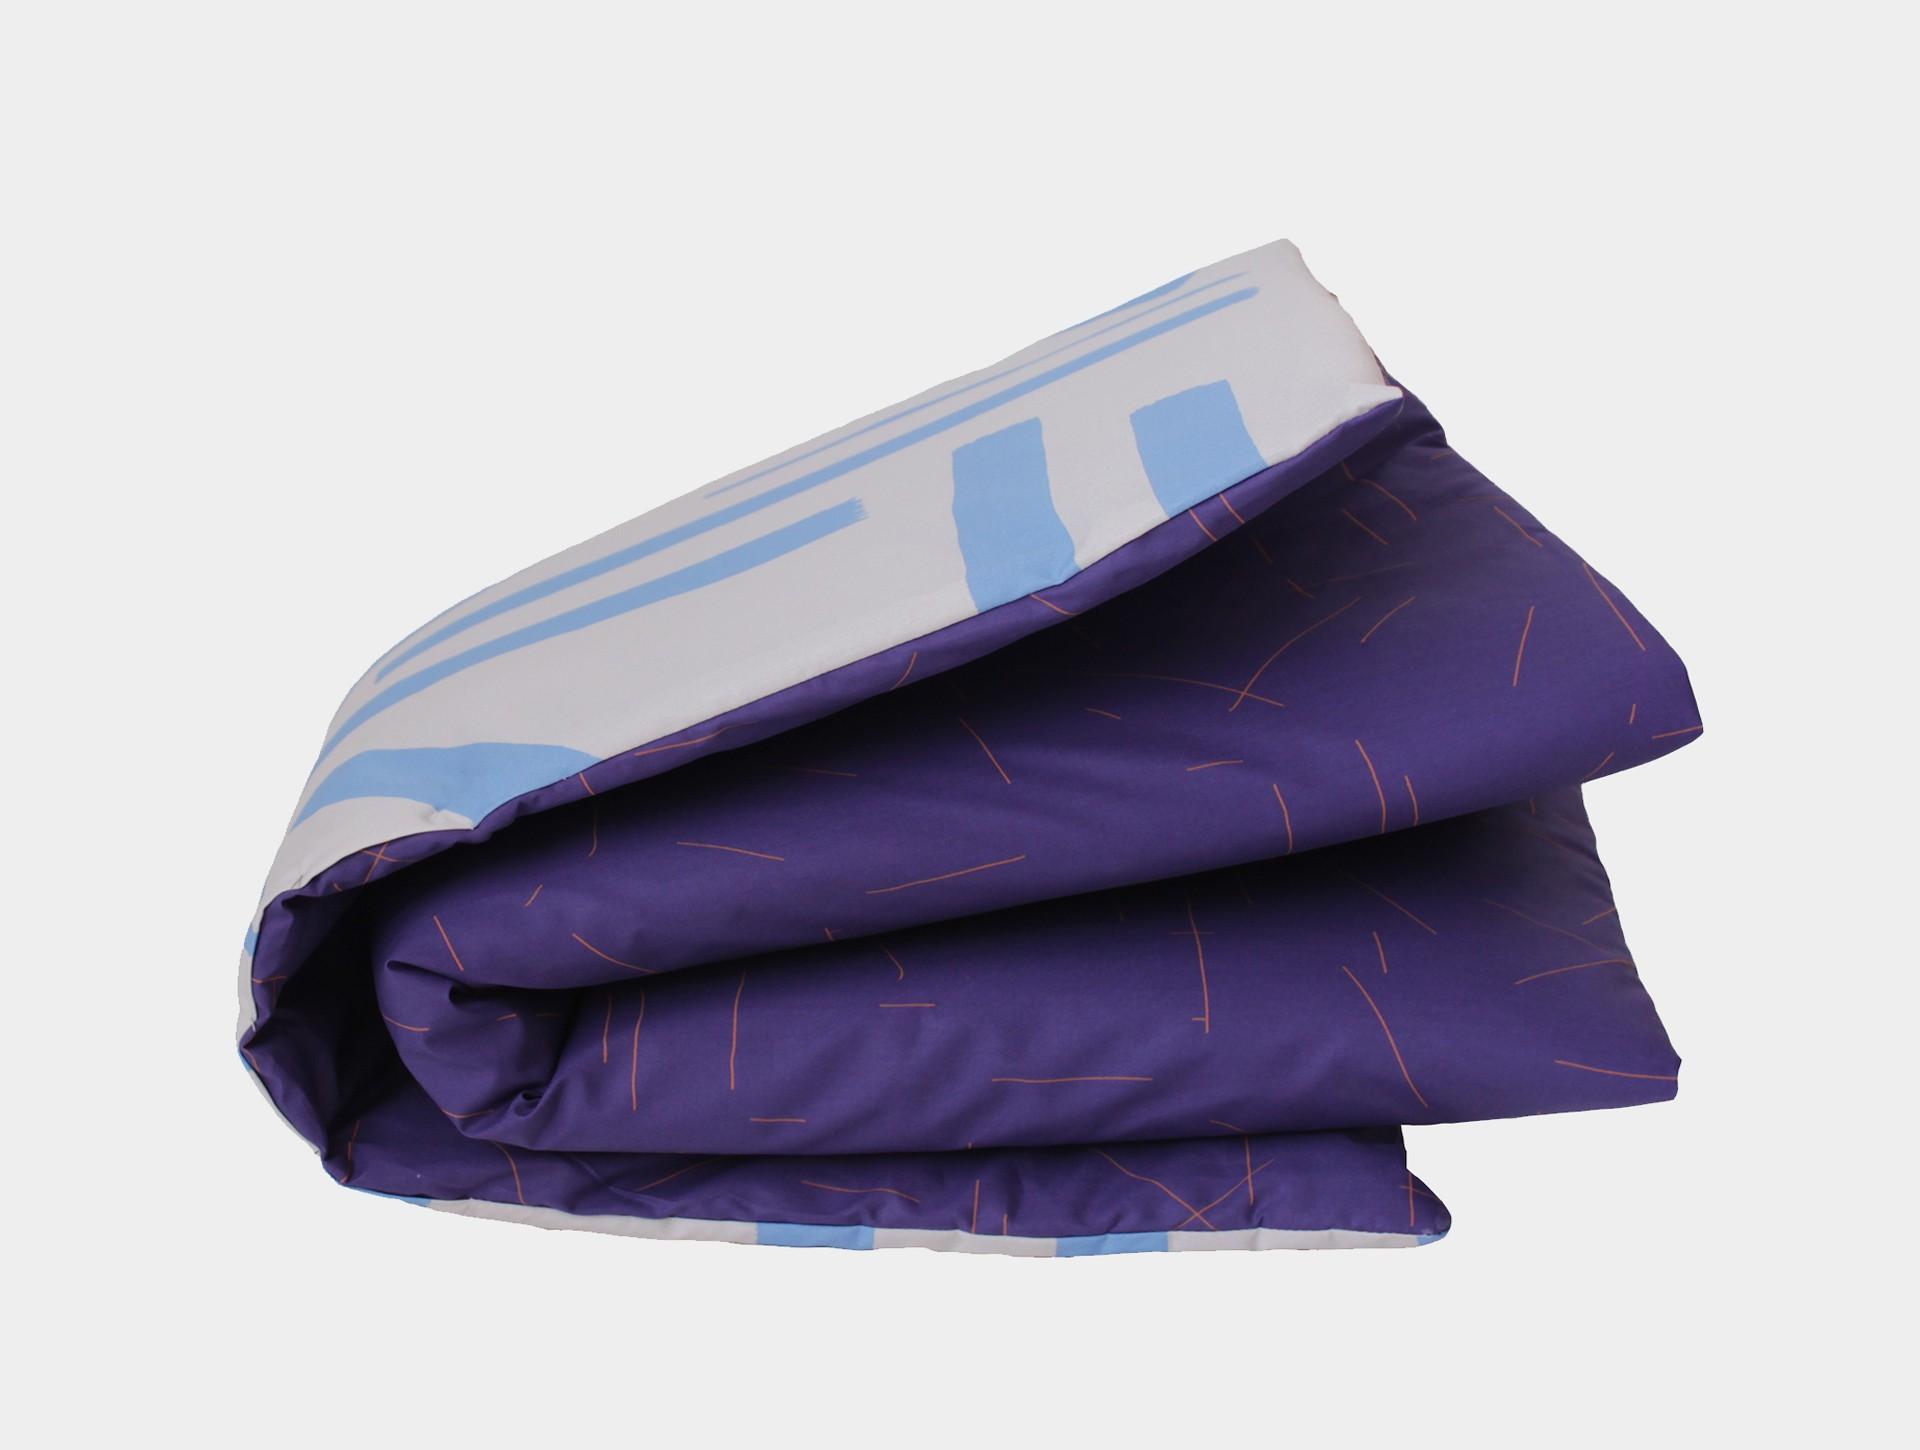 Speelkleed blauw-roestbruin / grijs-lichtblauw